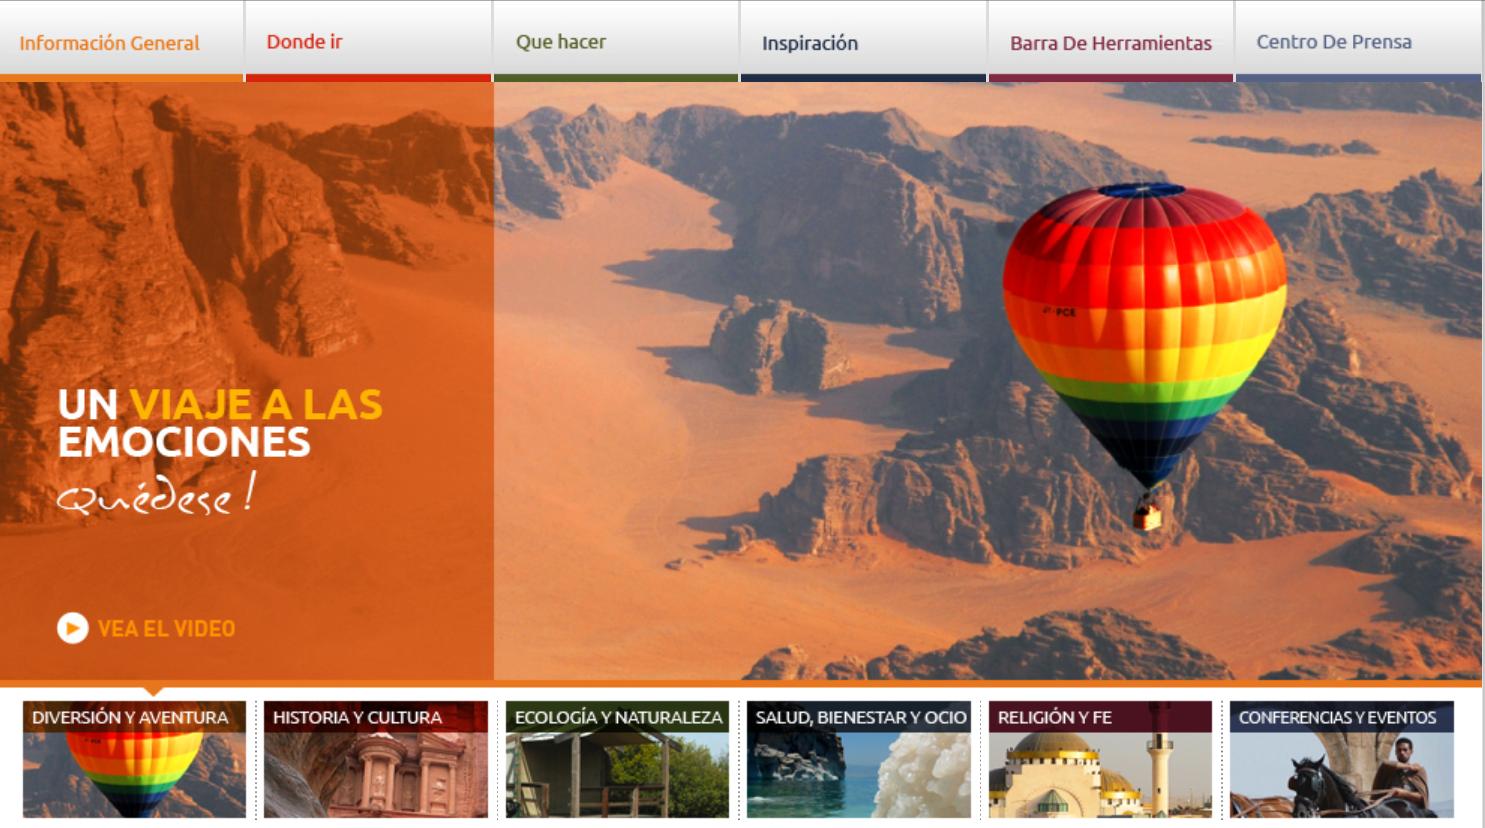 pagina web turismo de jordania